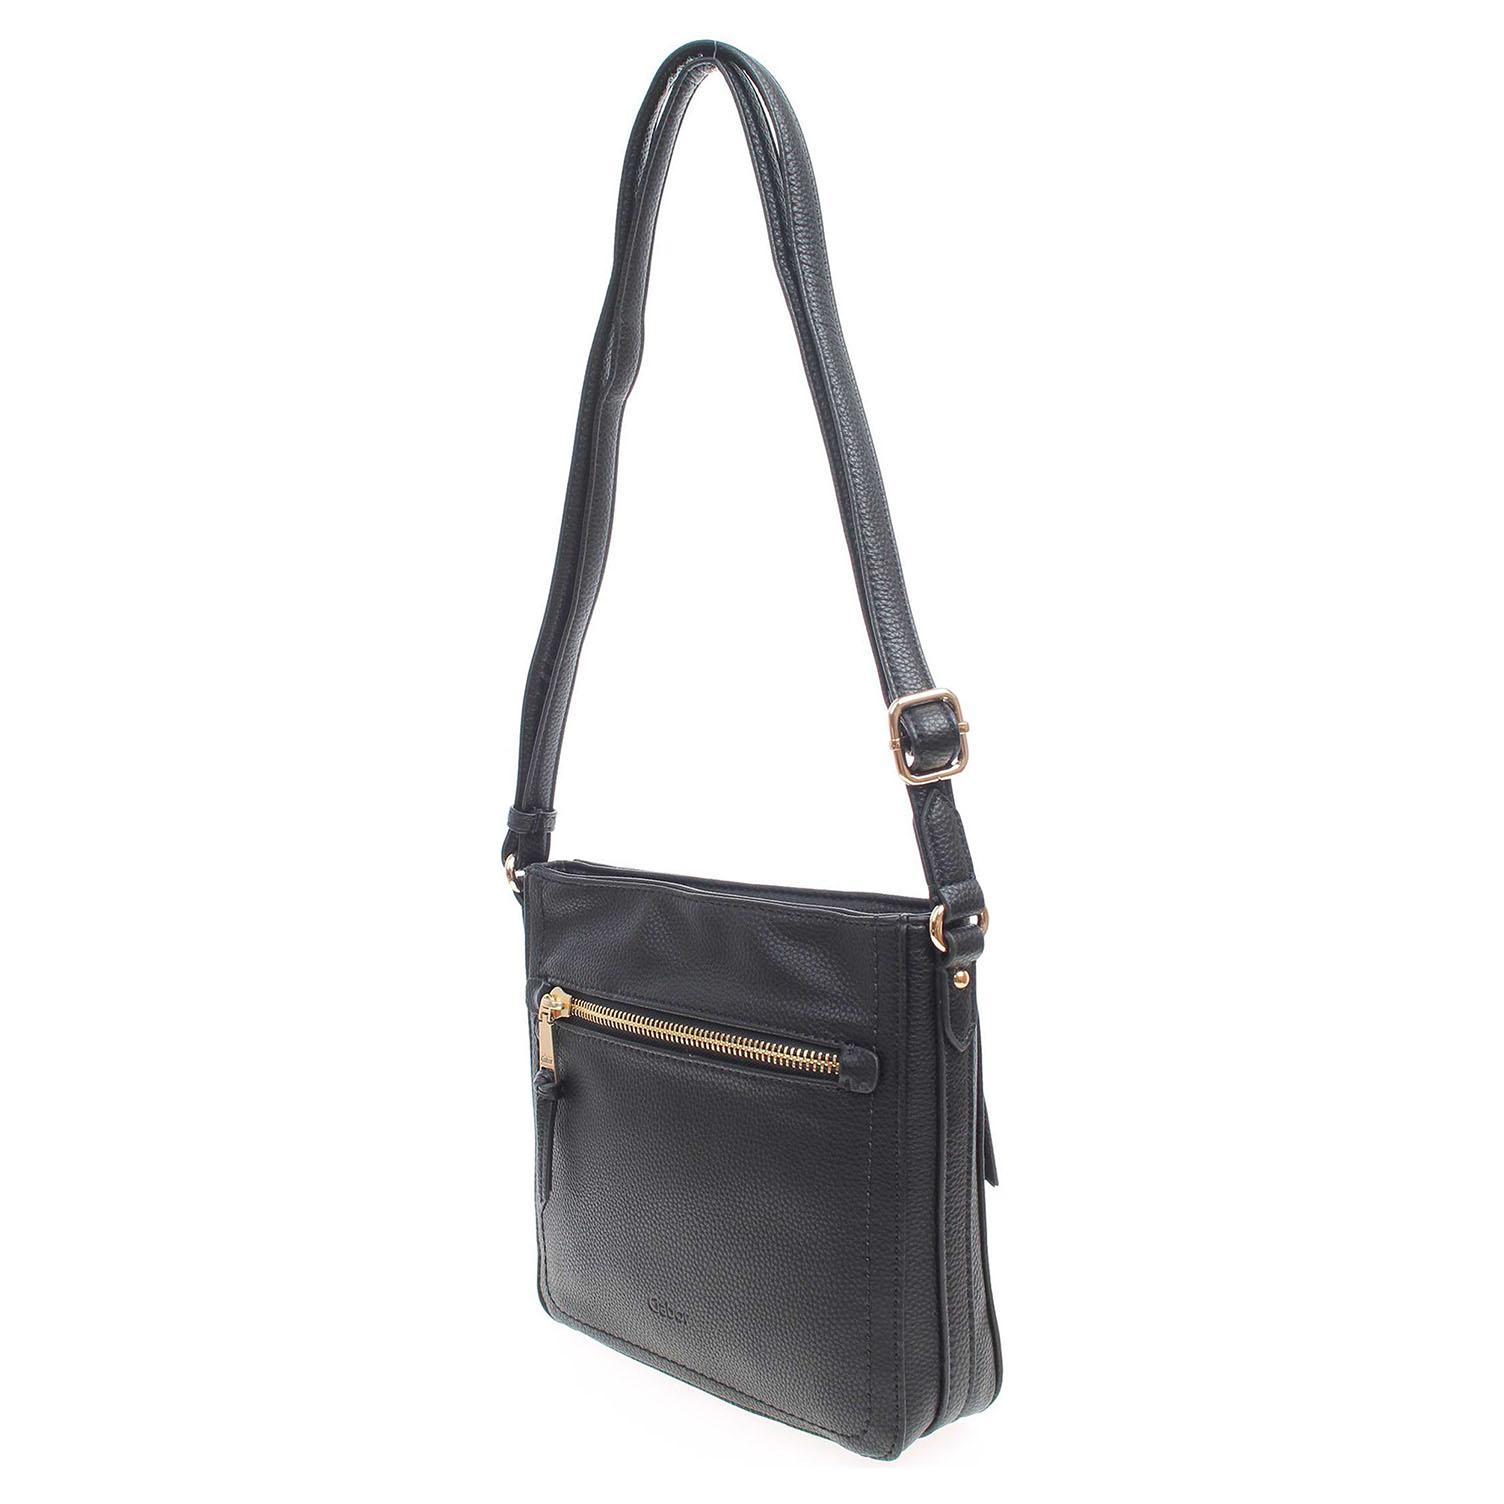 Ecco Gabor dámská kabelka 7769 60 Mona černá 11891235